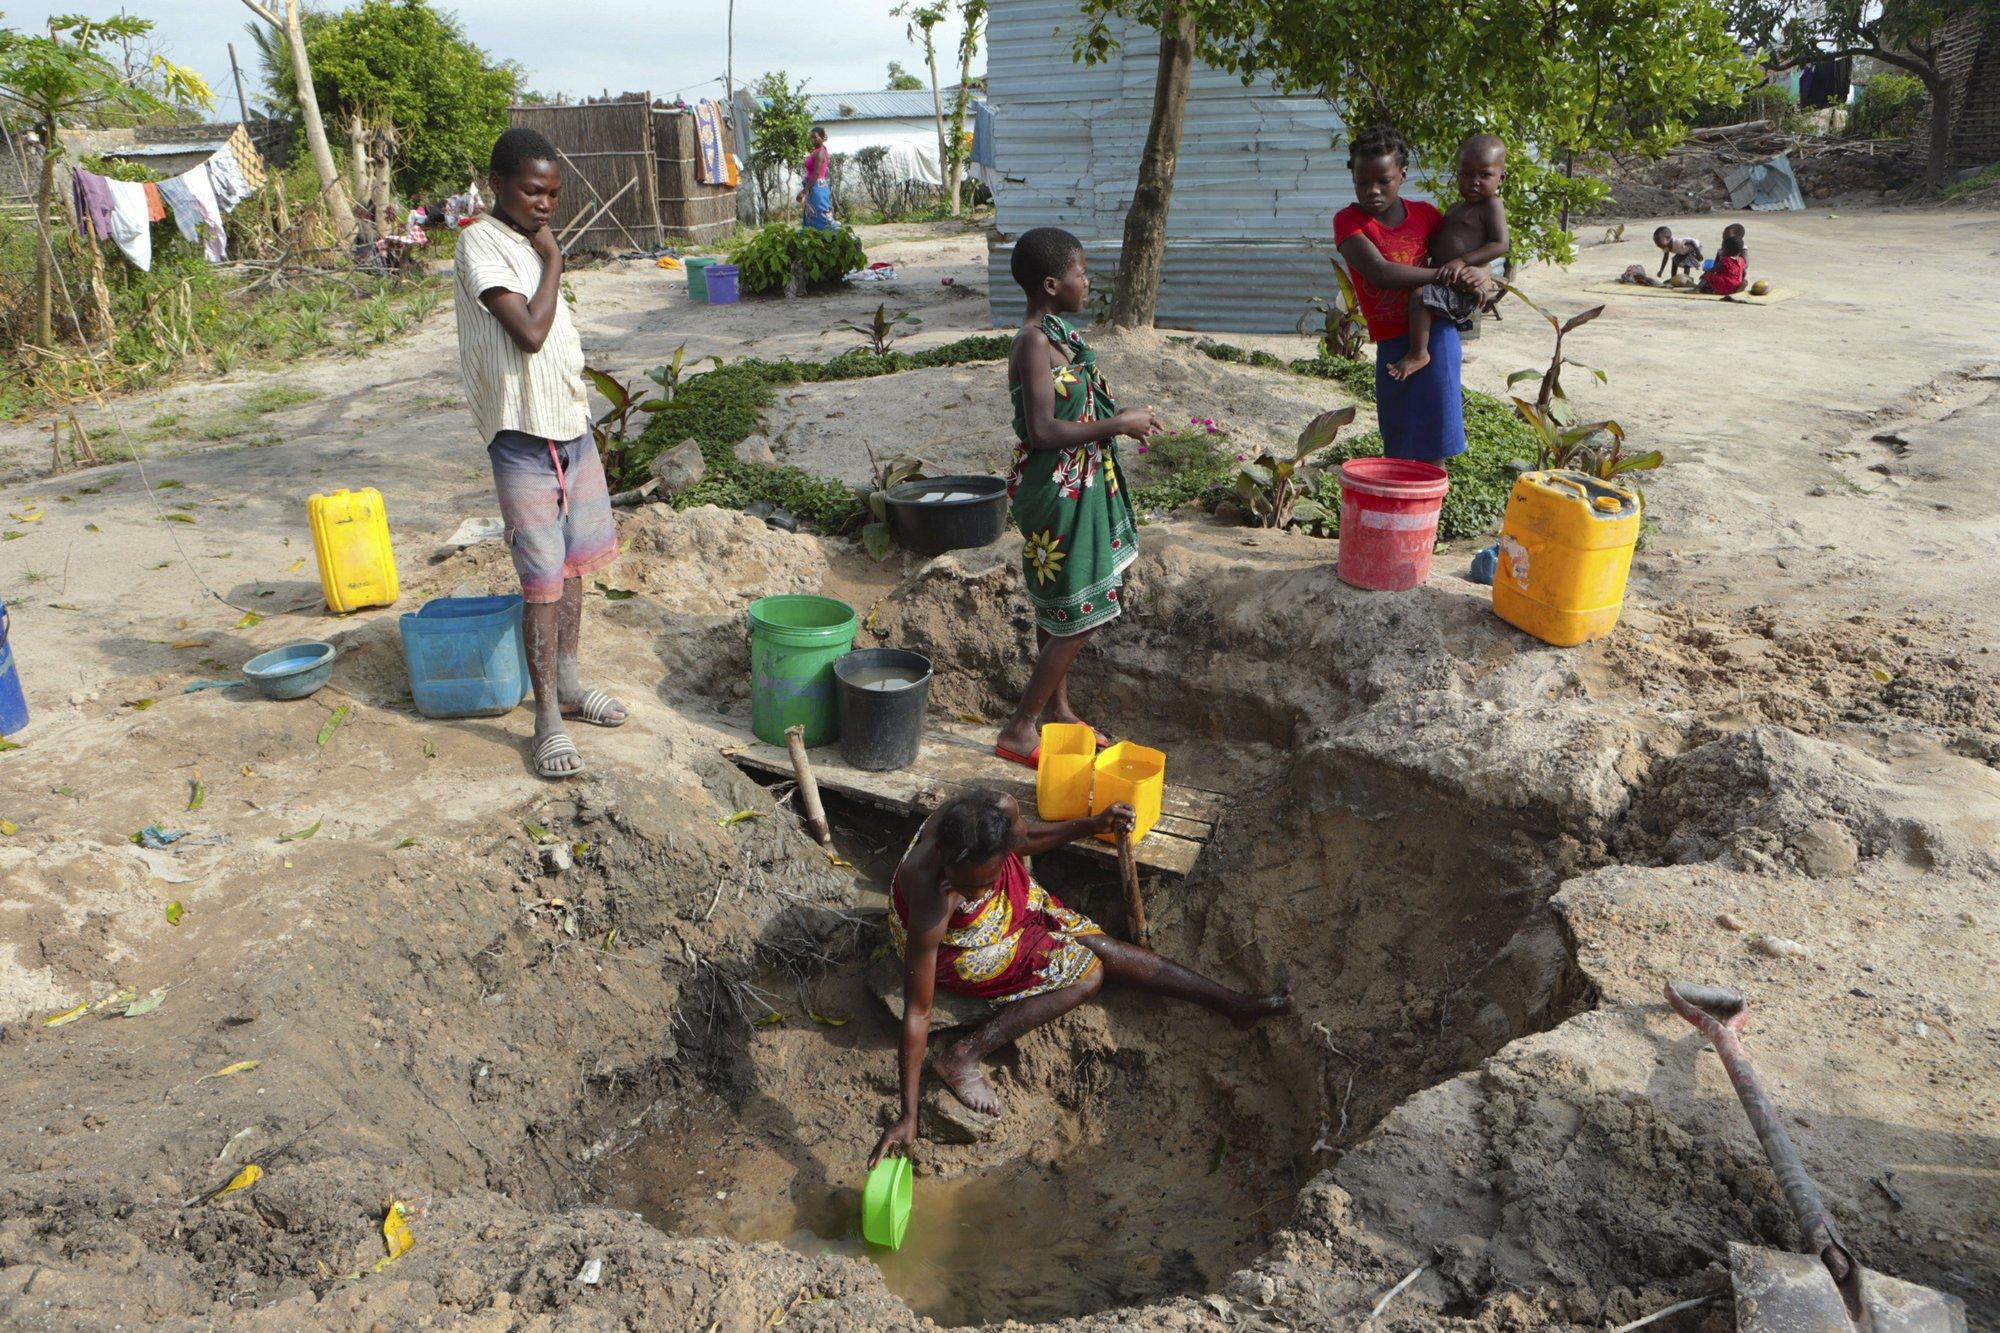 Mozambique races to contain 1,000 cholera cases